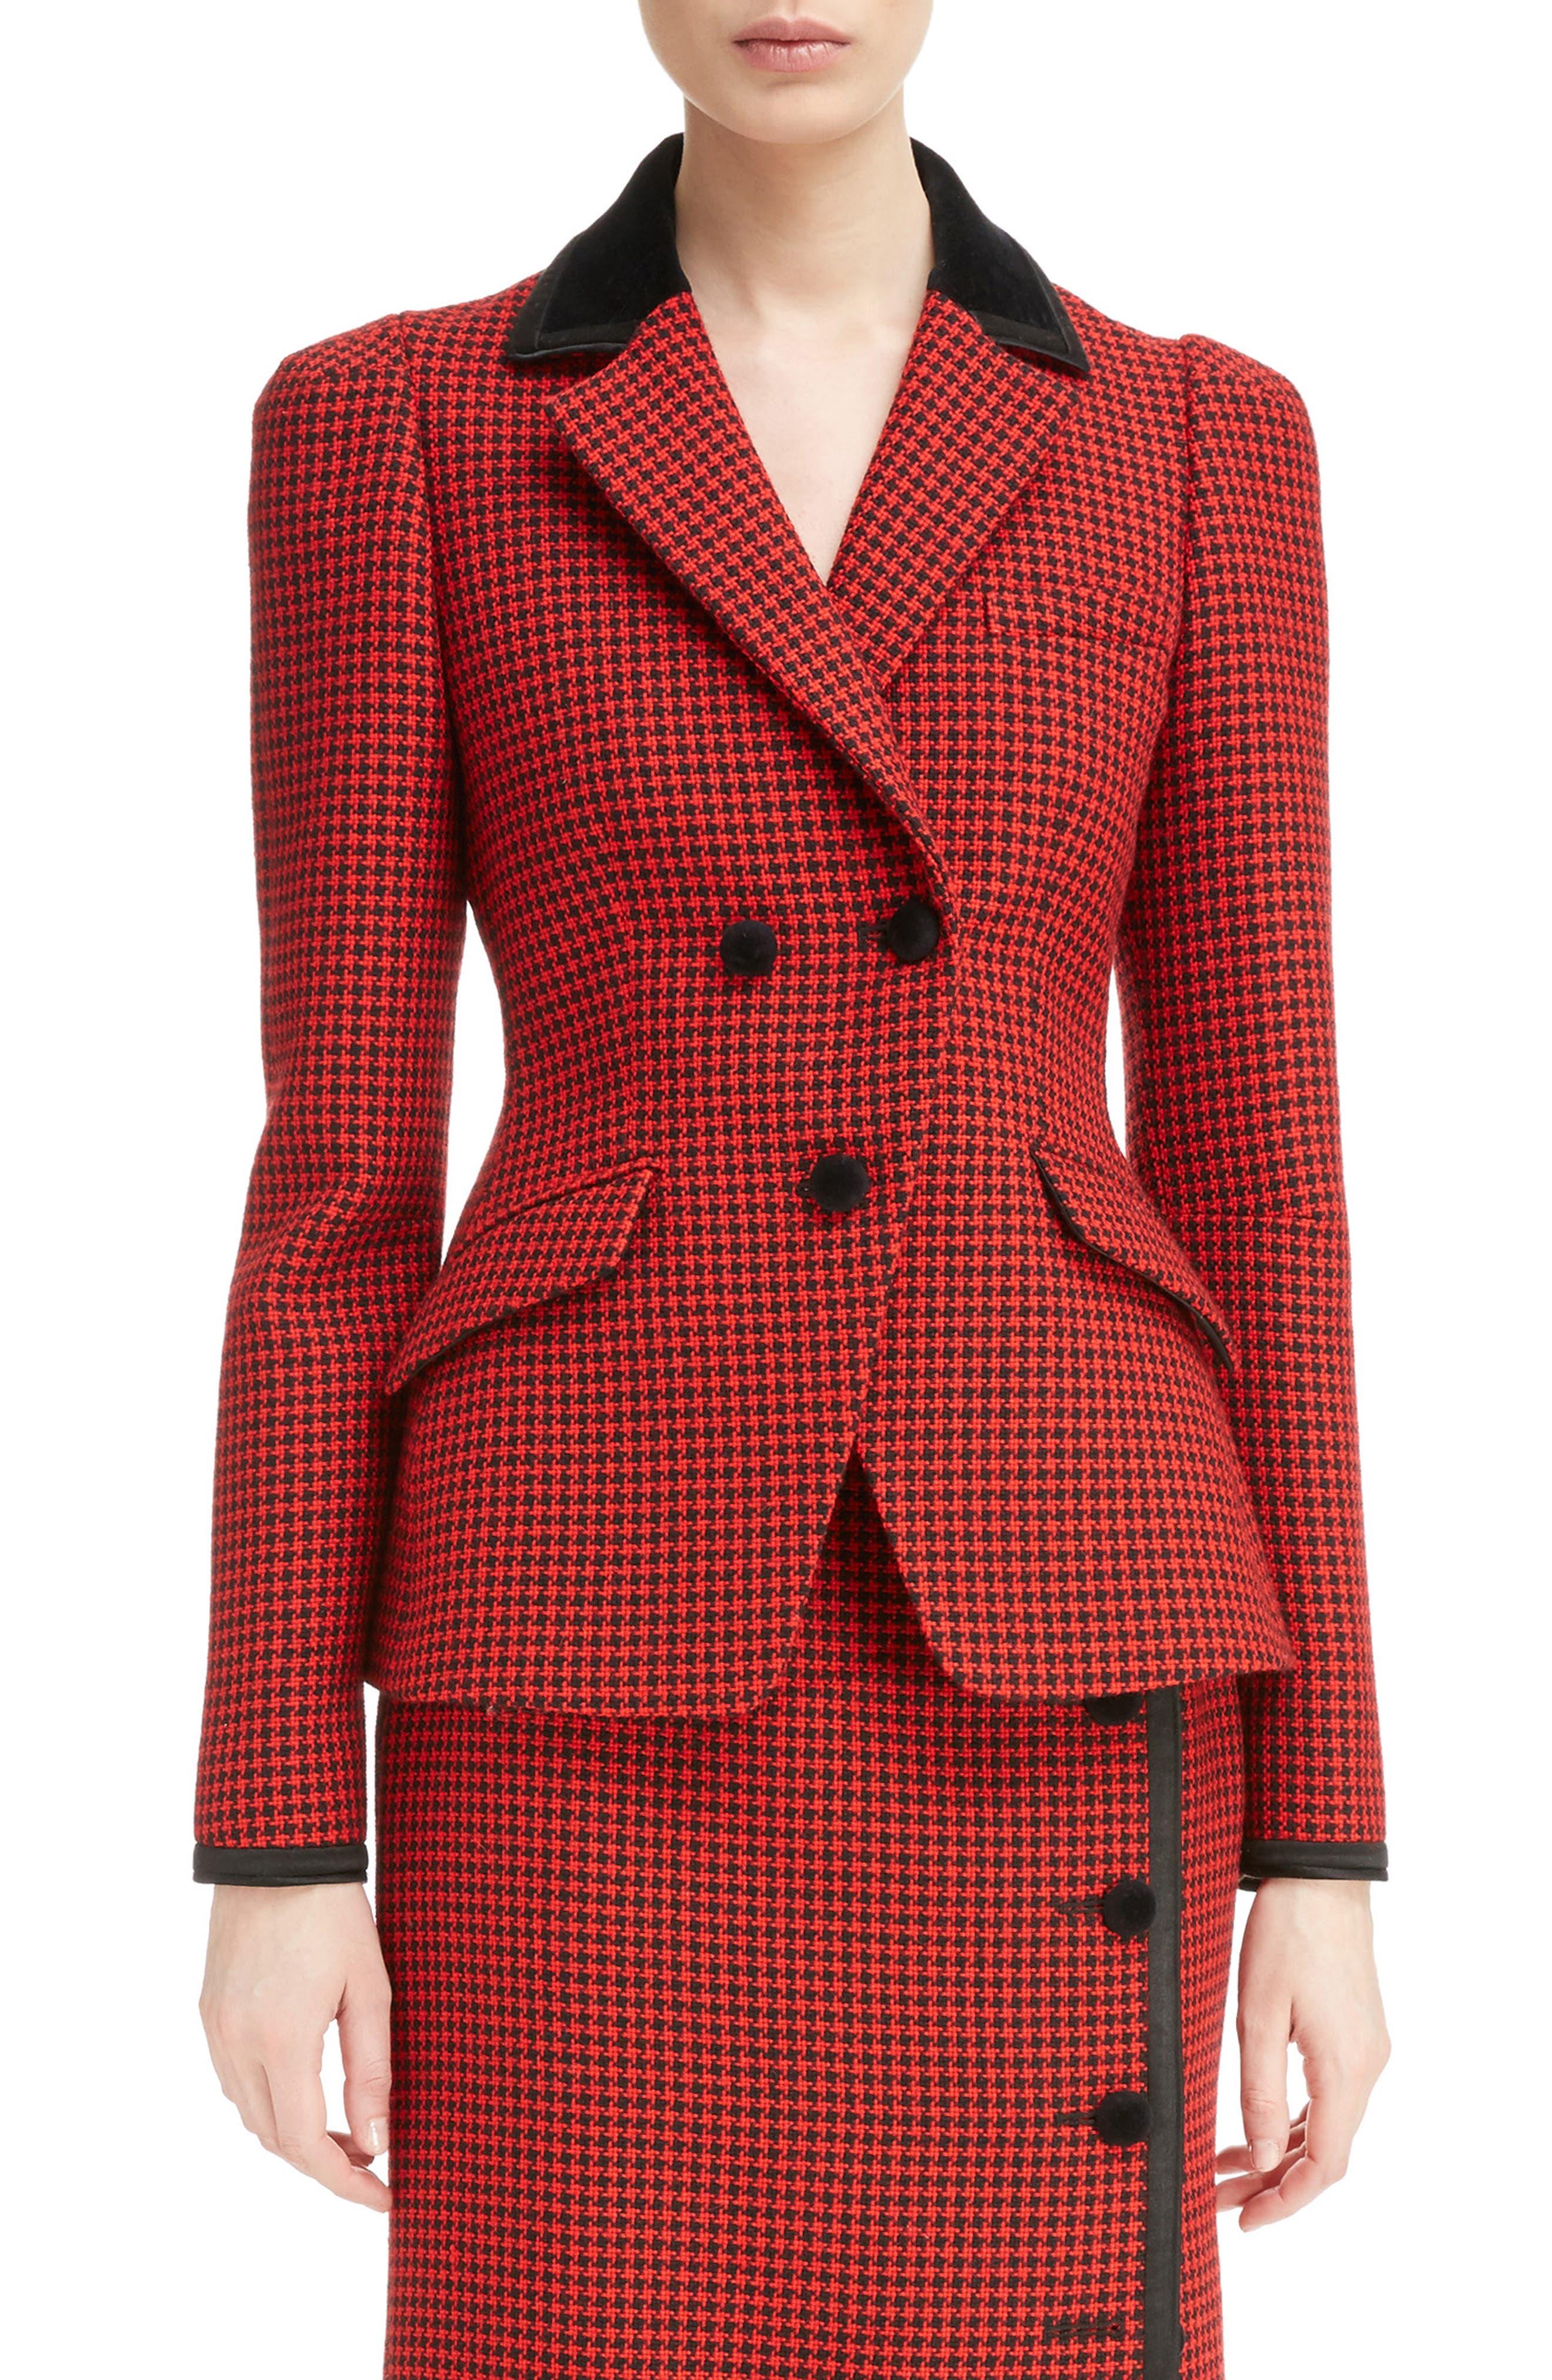 Paladini Houndstooth Wool Jacket,                         Main,                         color, Scarlet/ Black